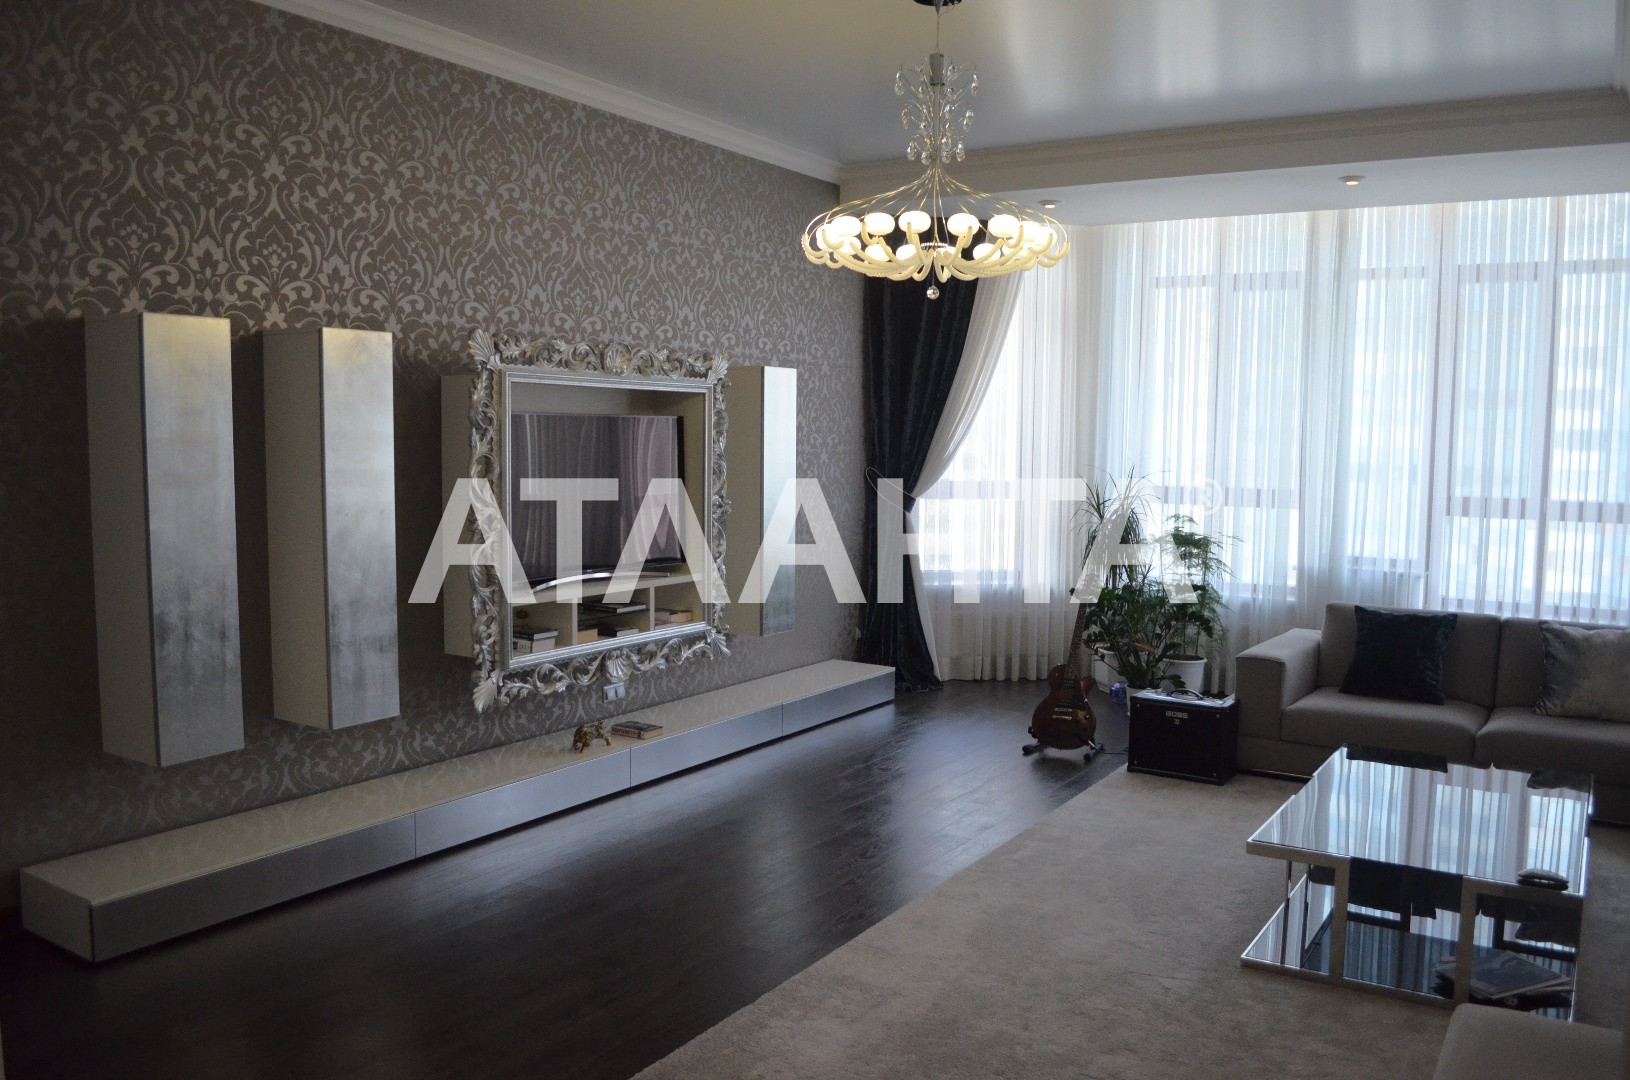 Продается 4-комнатная Квартира на ул. Генуэзская — 550 000 у.е. (фото №6)